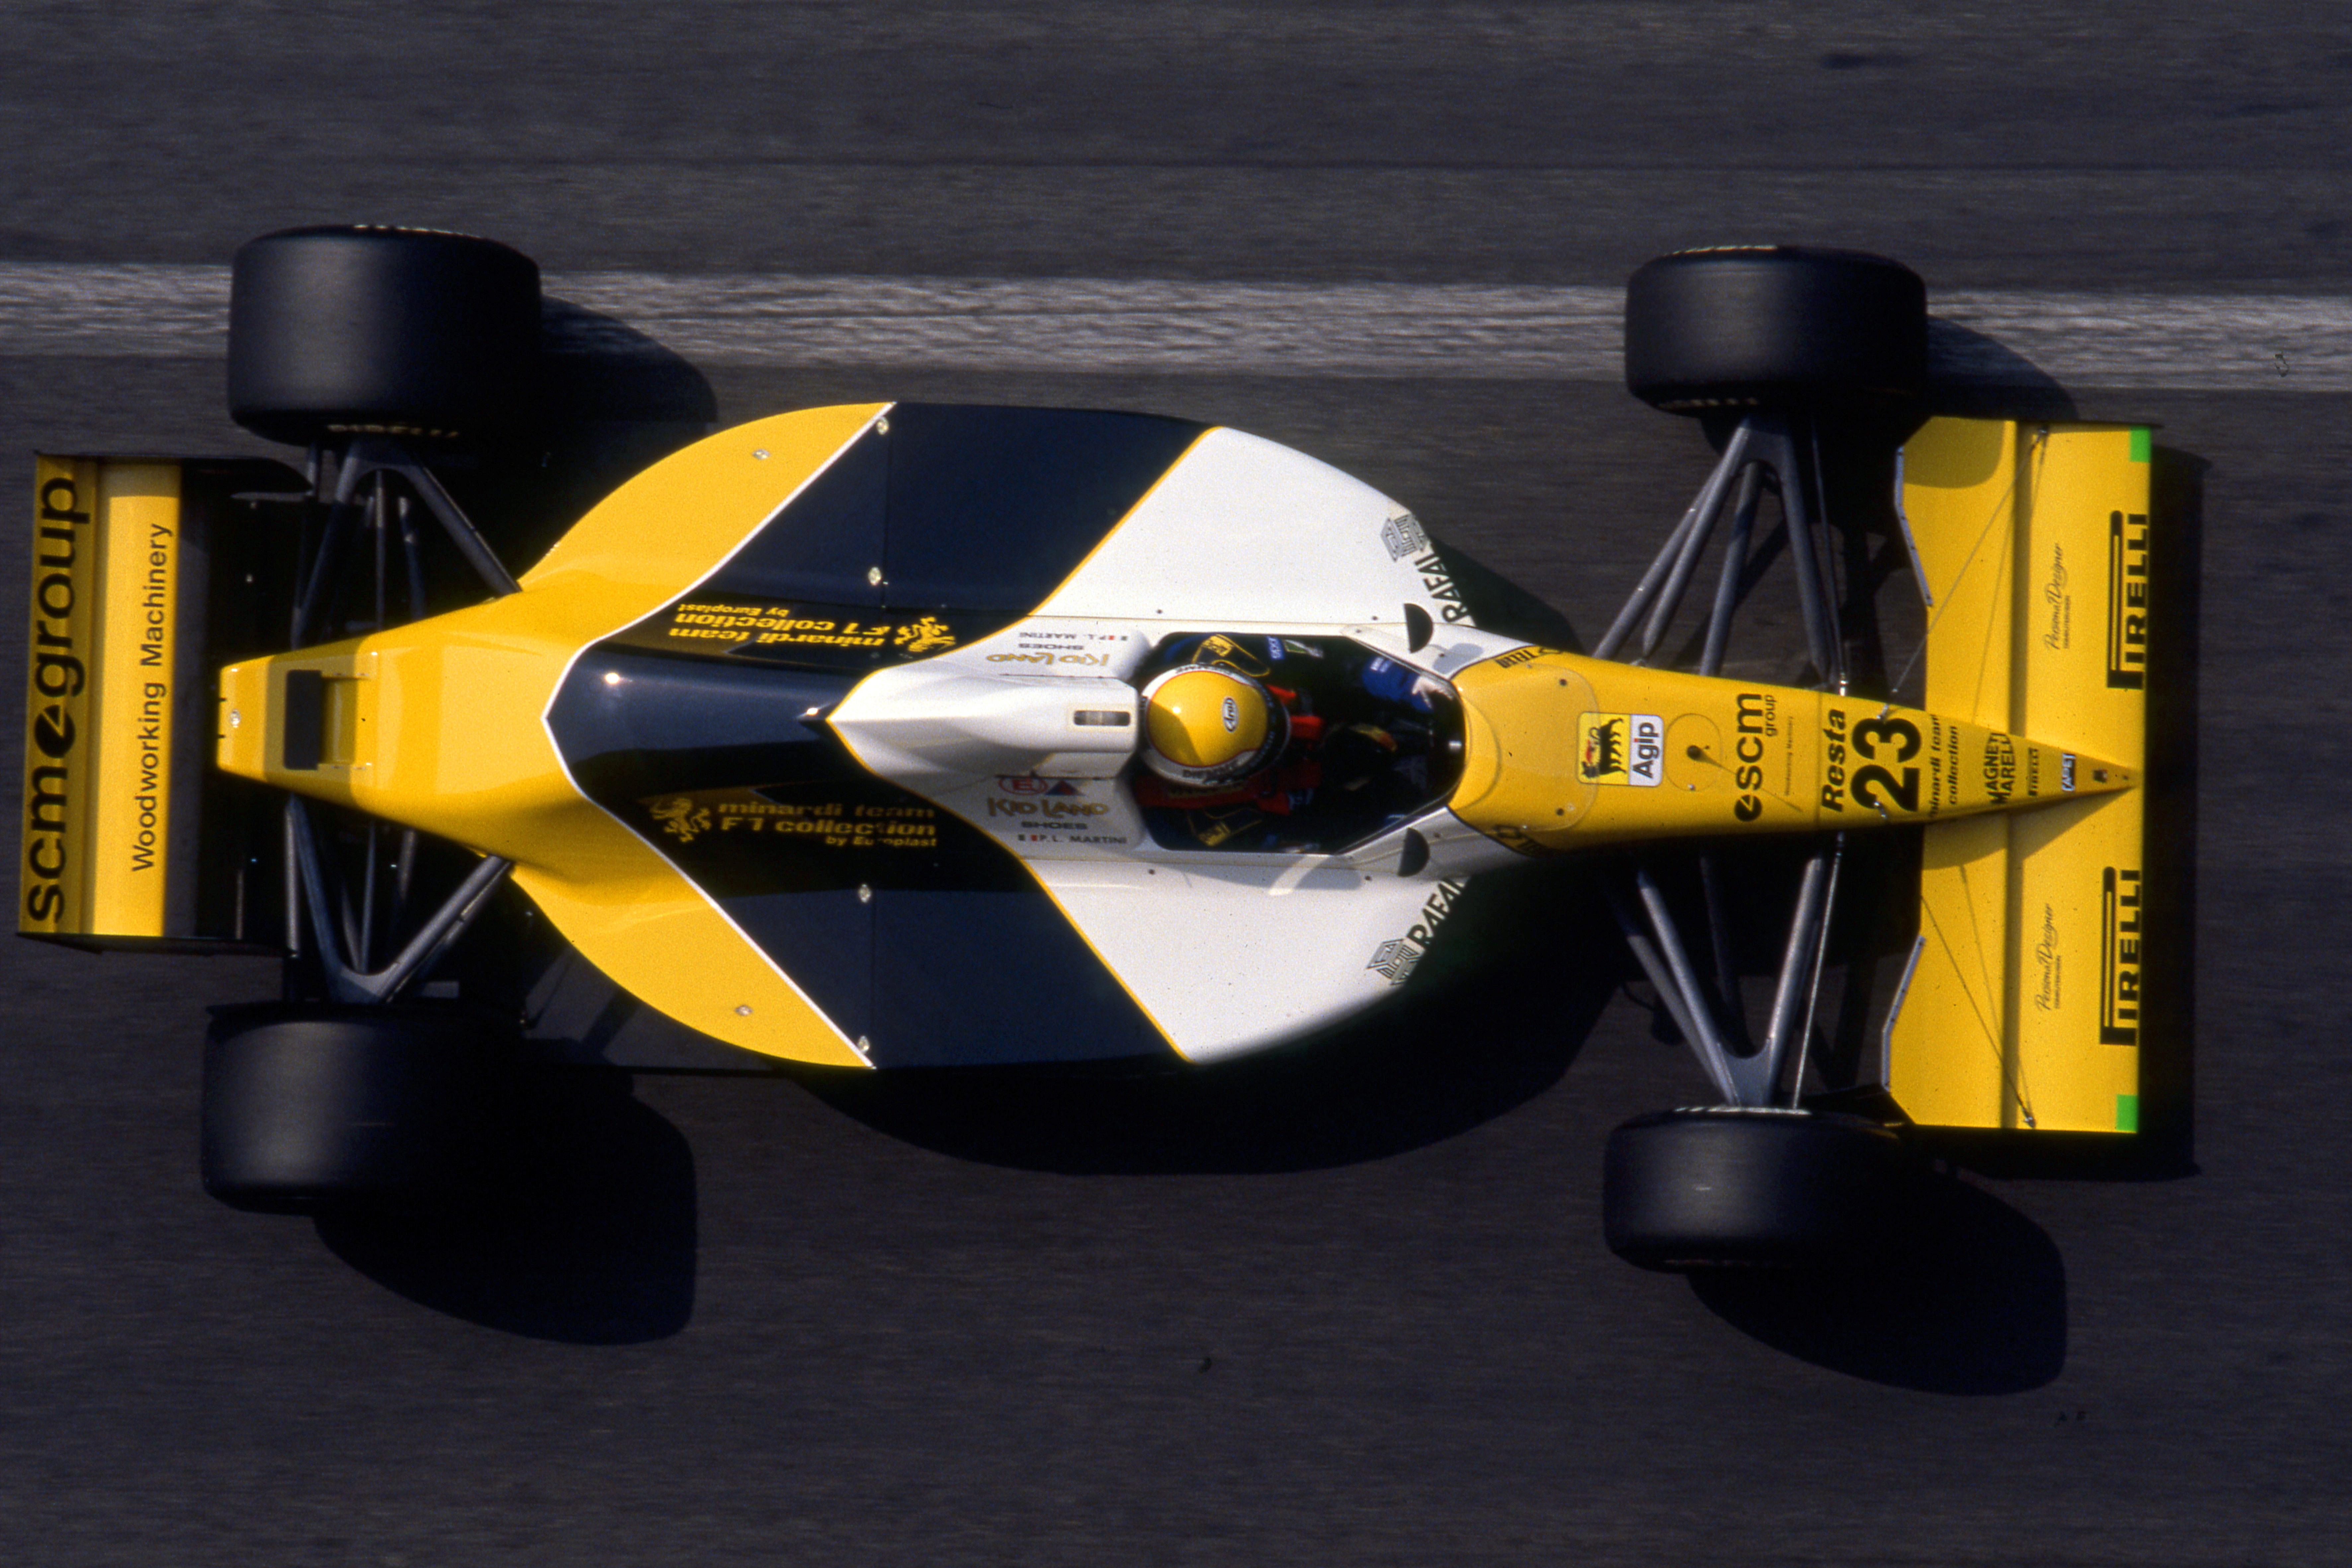 Pierluigi Martini Minardi F1 1990